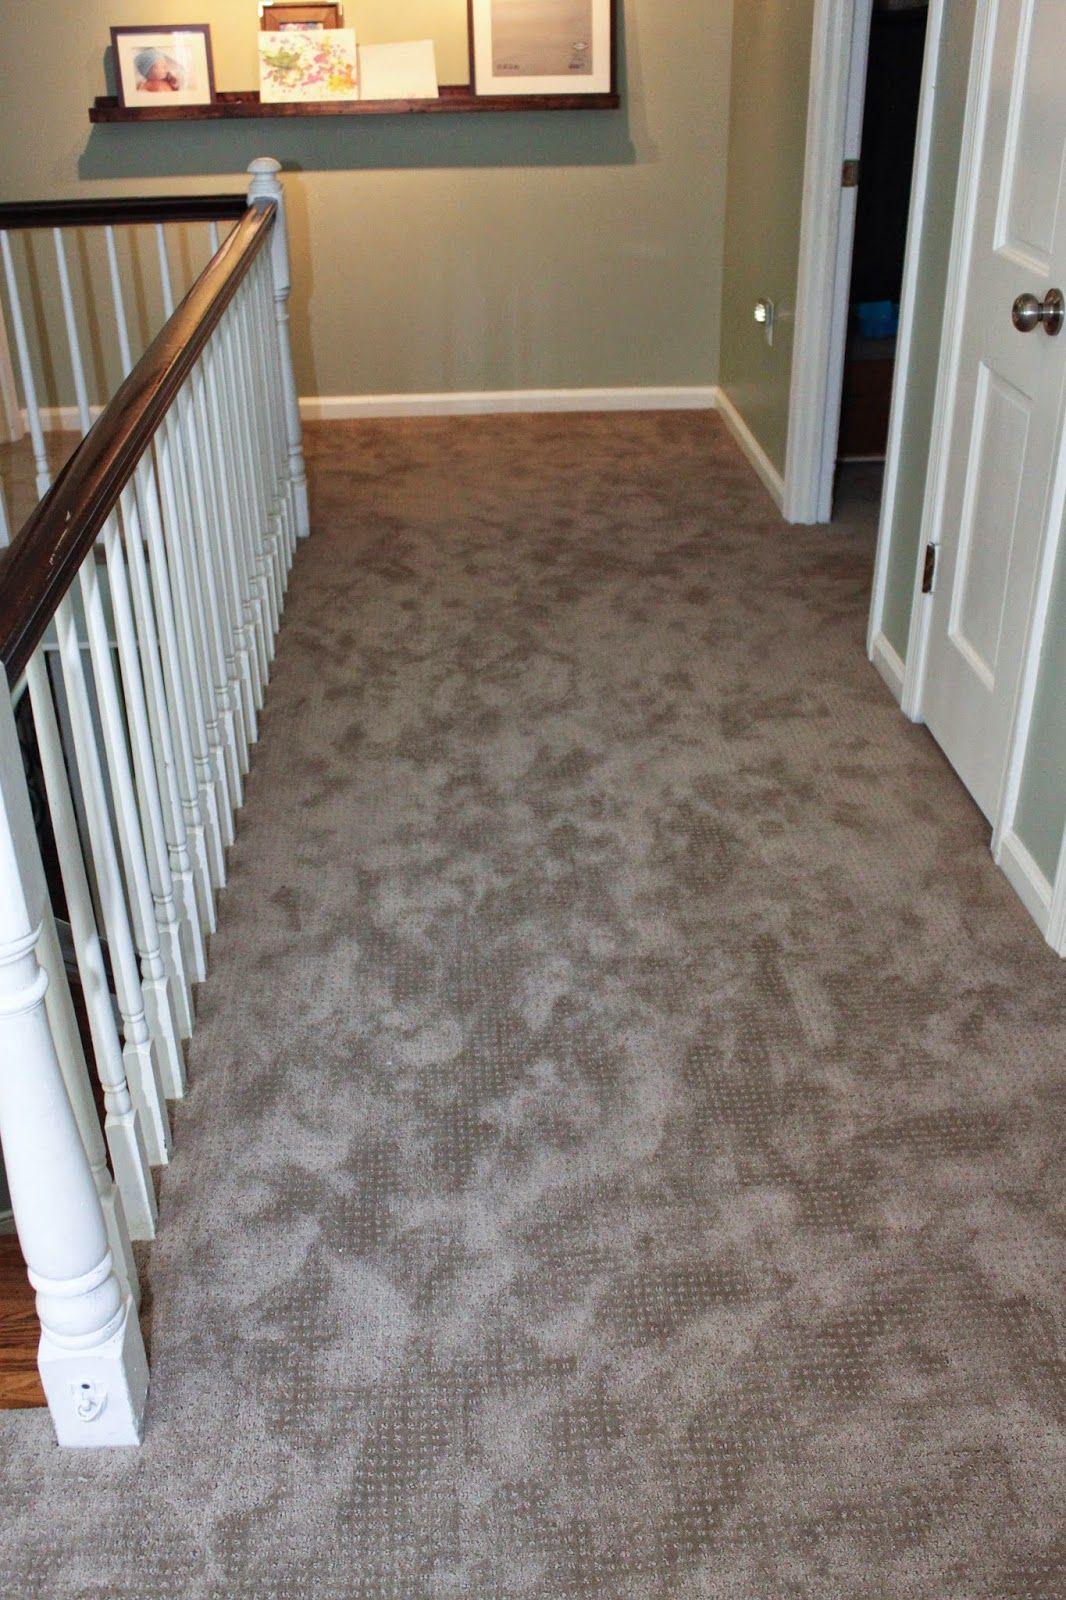 Shaw Carpet in perfect beige Stair runner carpet, Carpet